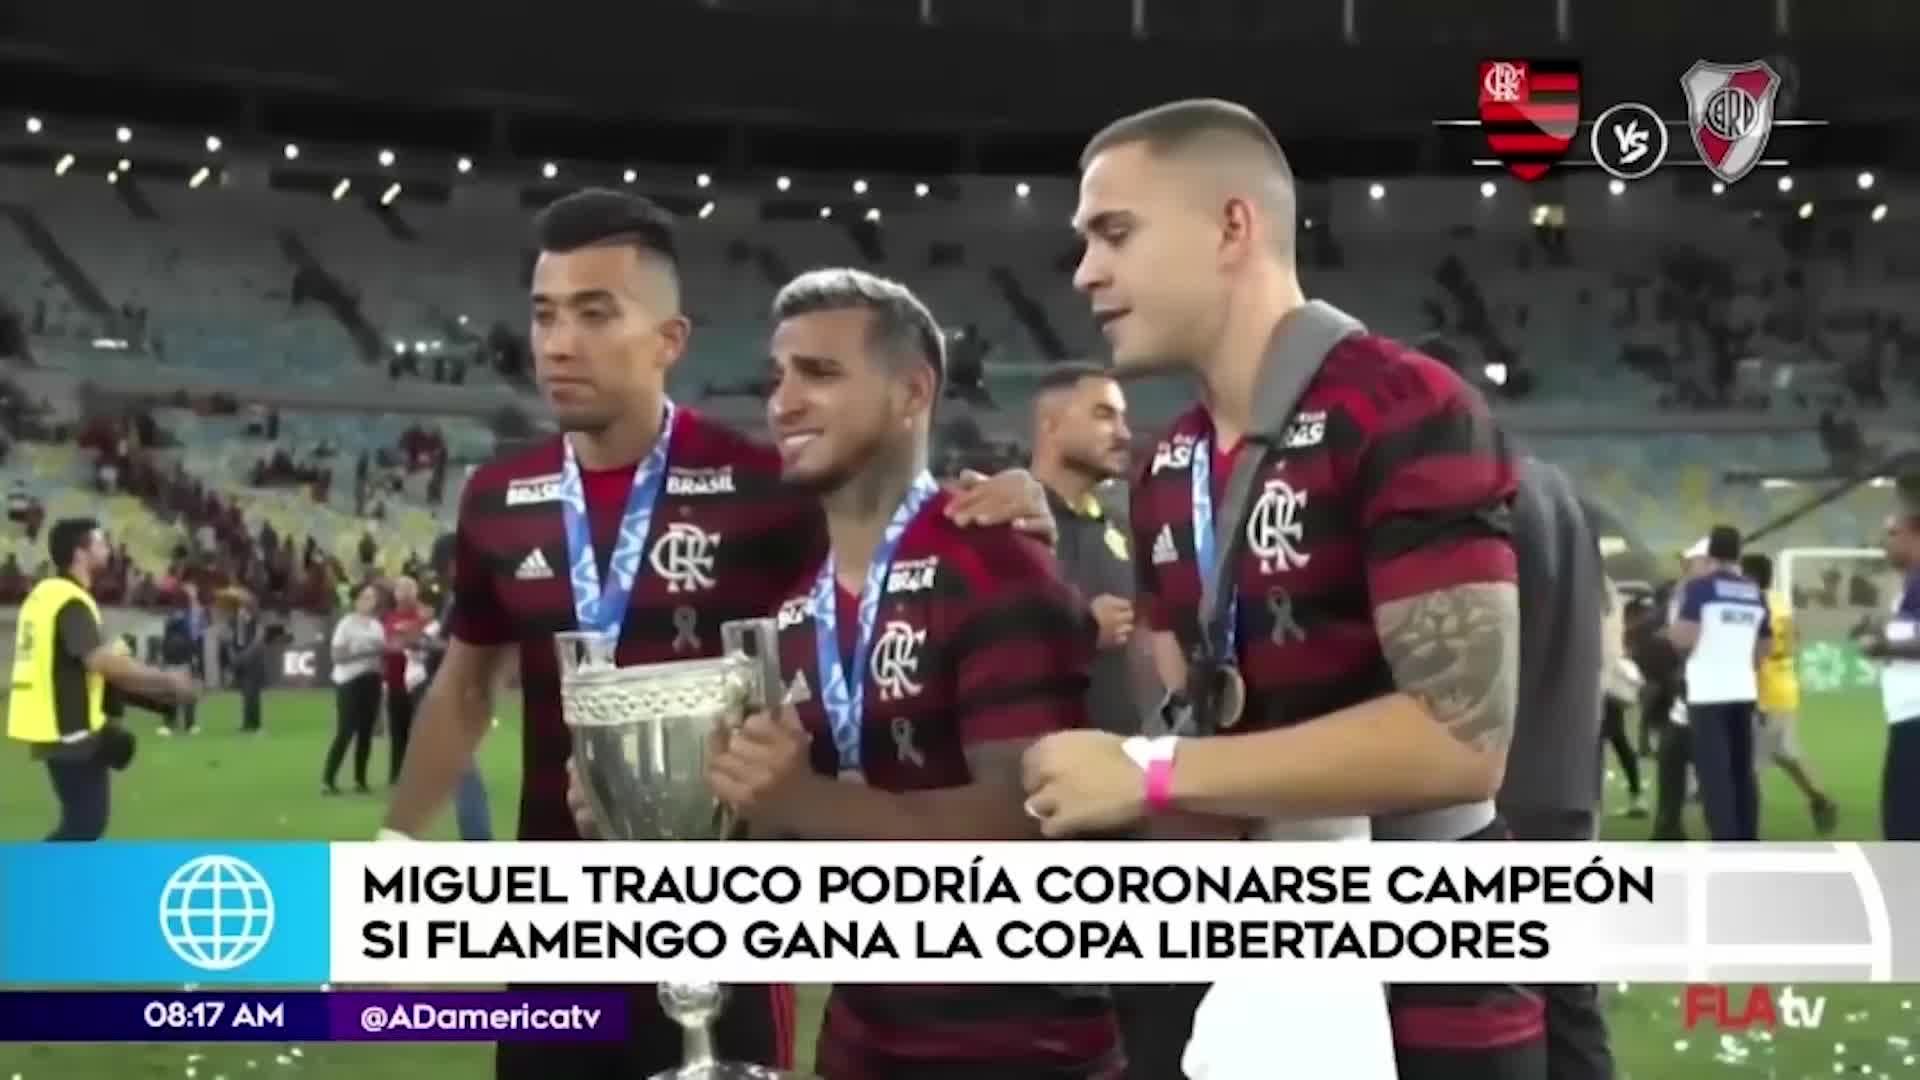 Copa Libertadores: Miguel Trauco podría coronarse campeón si Flamengo vence a River Plate